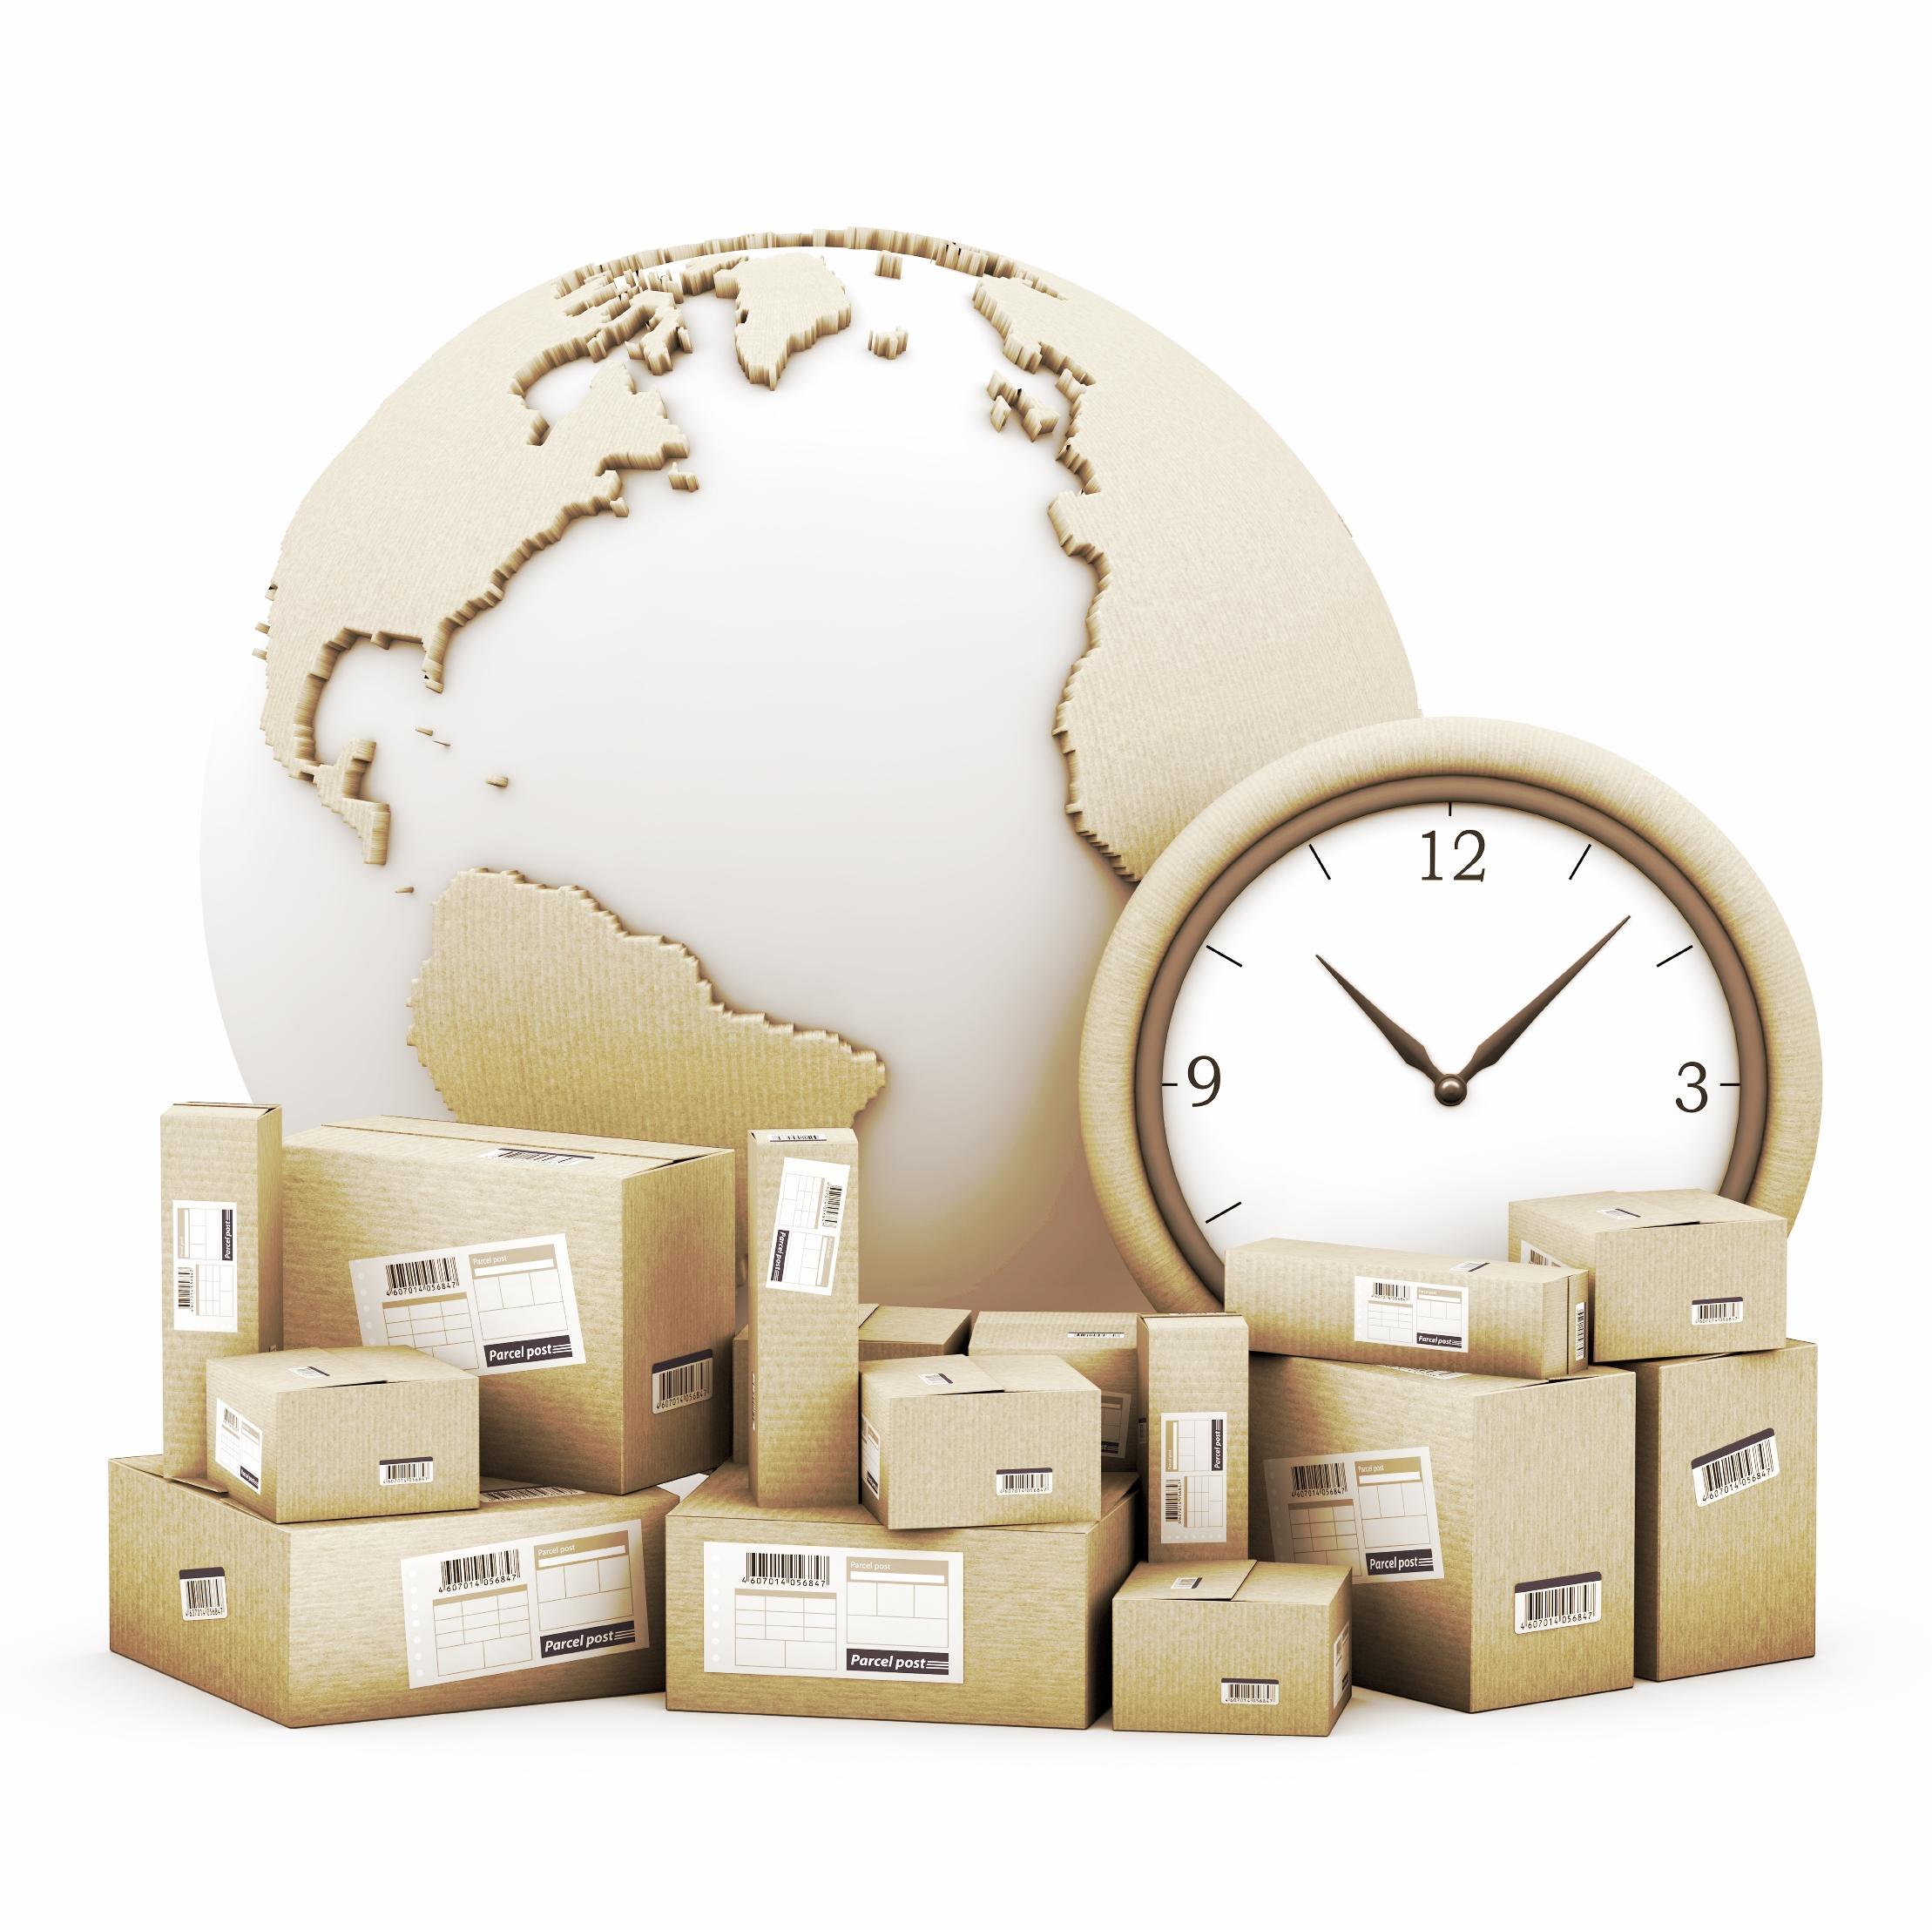 stock-photo-22095358-world-shipments.jpg